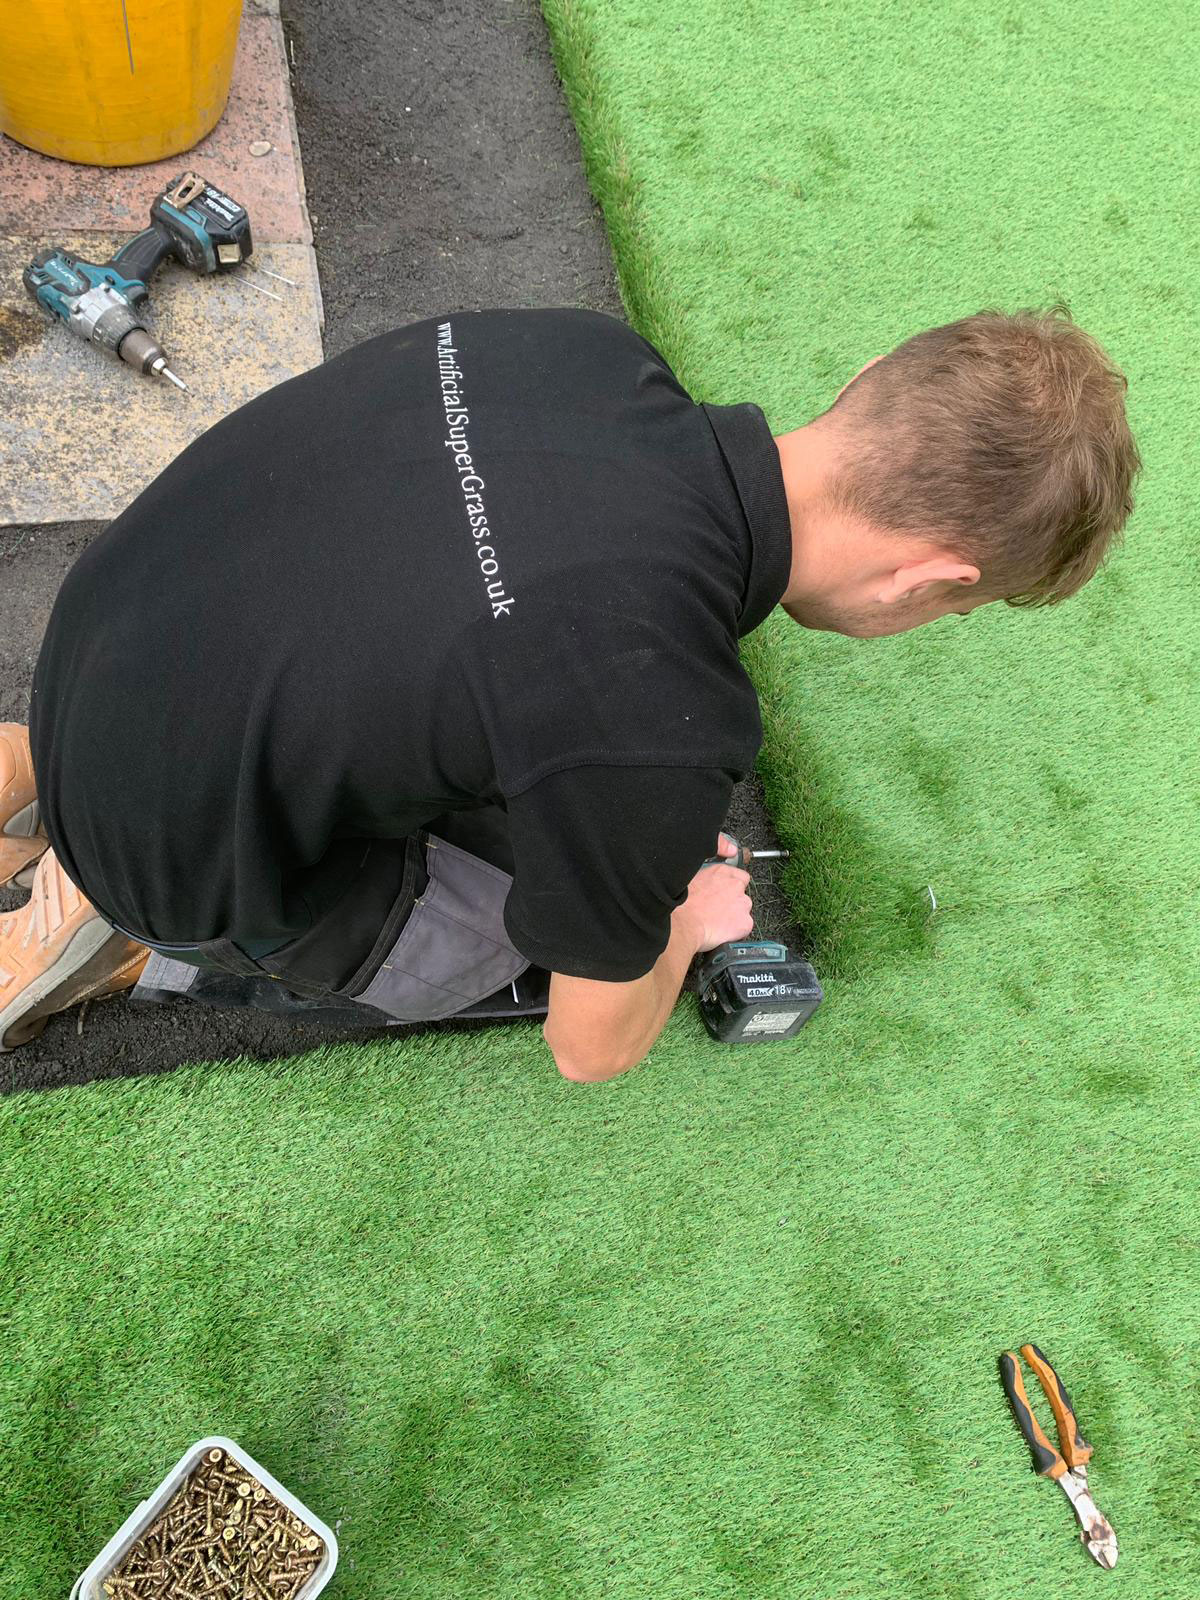 Fake Grass for Dogs Pontefract Artificial Super Grass